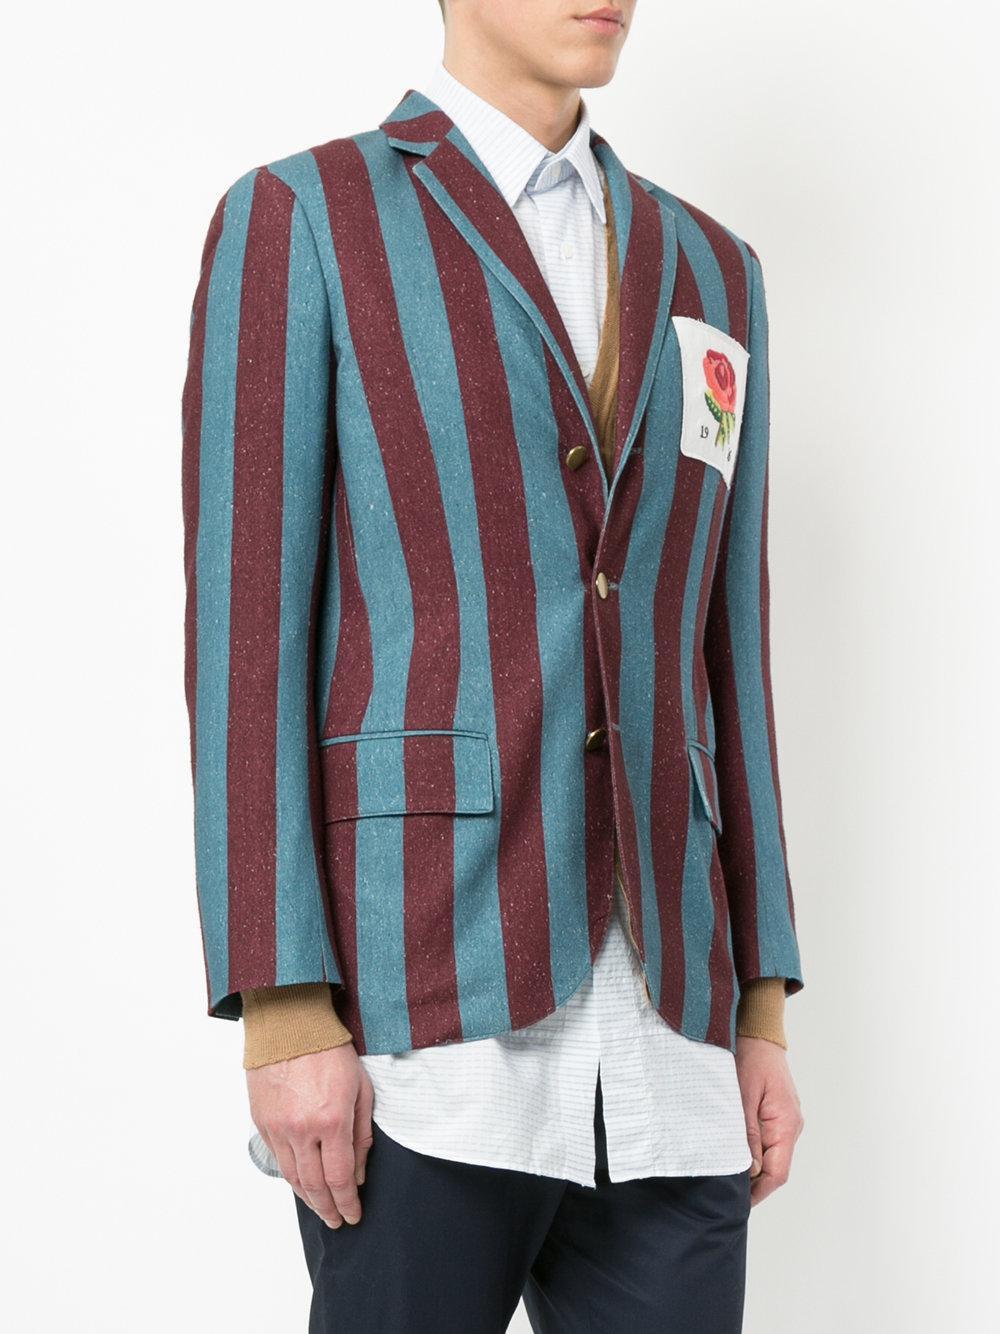 Patch Striped Kent For amp; Blazer Lyst Men Curwen View Blue Fullscreen Rose waatx1Xgq